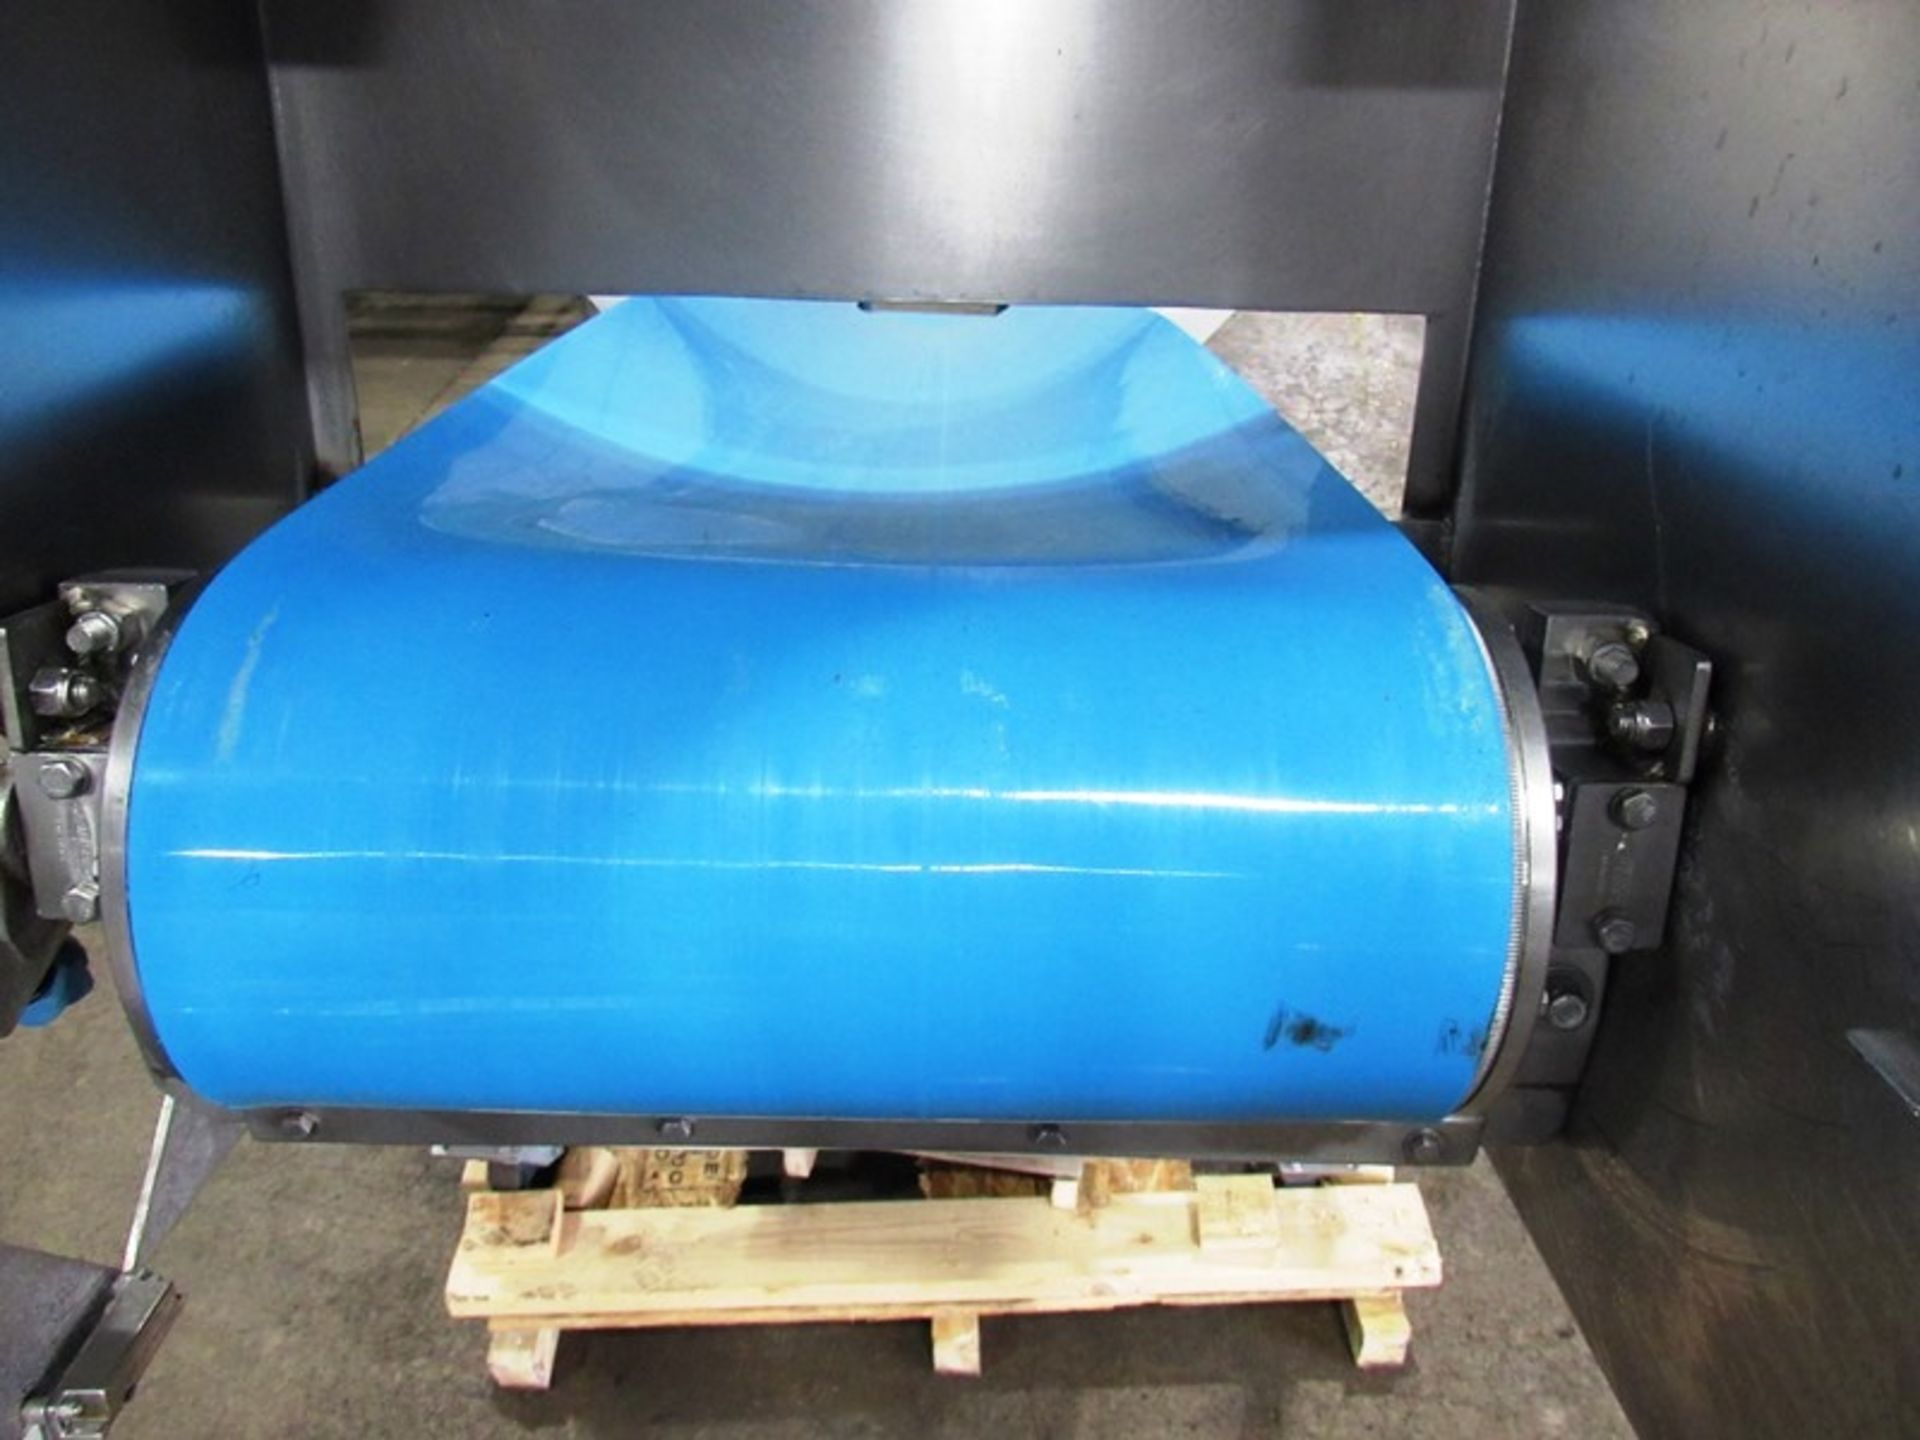 "Stainless Steel Incline Conveyor, 18"" Wide X 11' Long neoprene beltk 12"" inveed, 5' discharge, drum - Image 4 of 5"